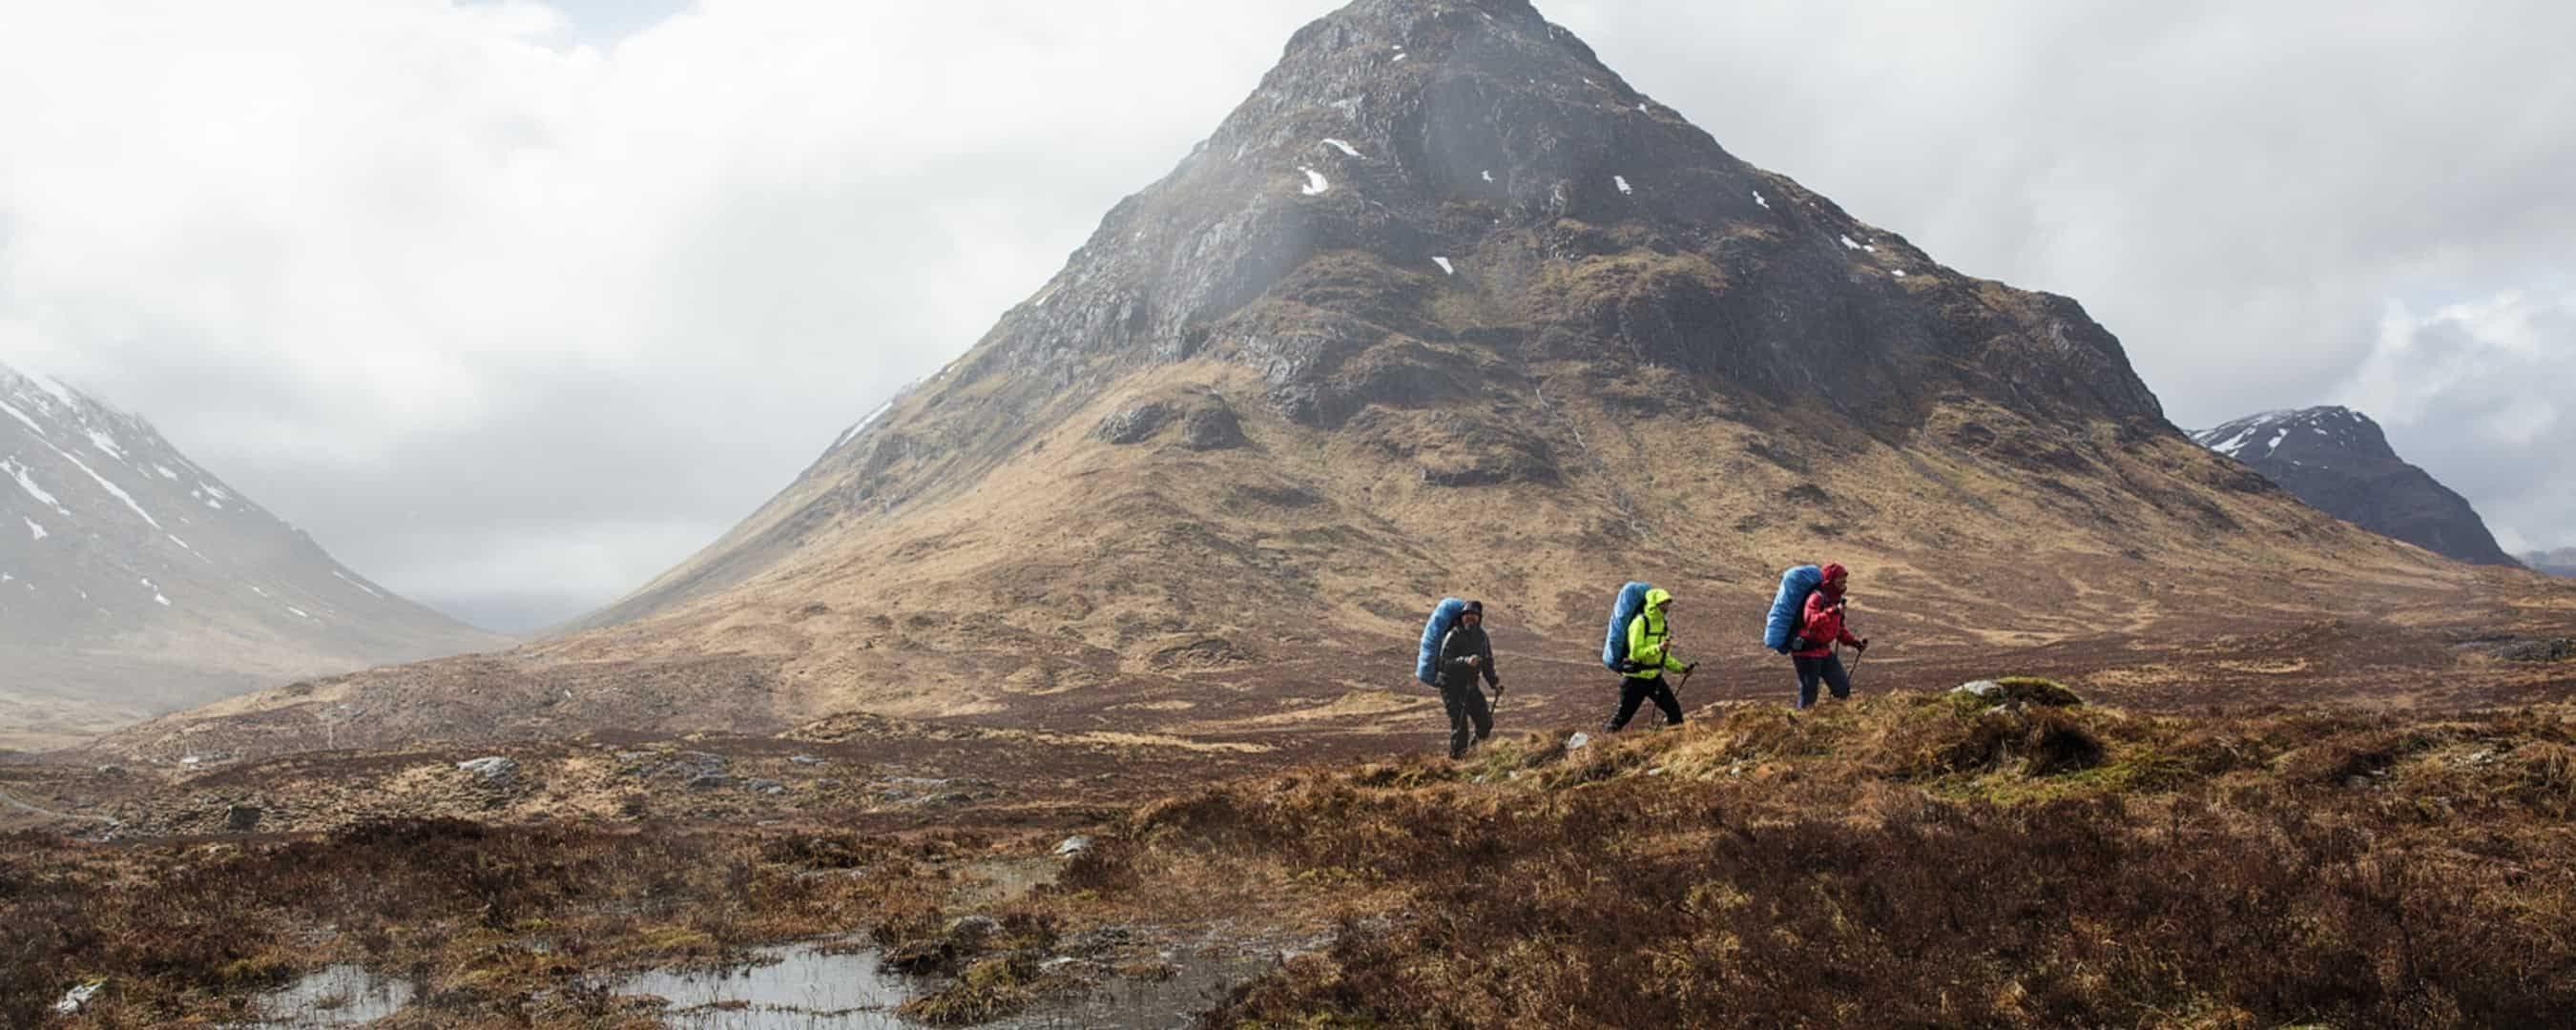 . Deuter: 120 years of backpacking adventures.